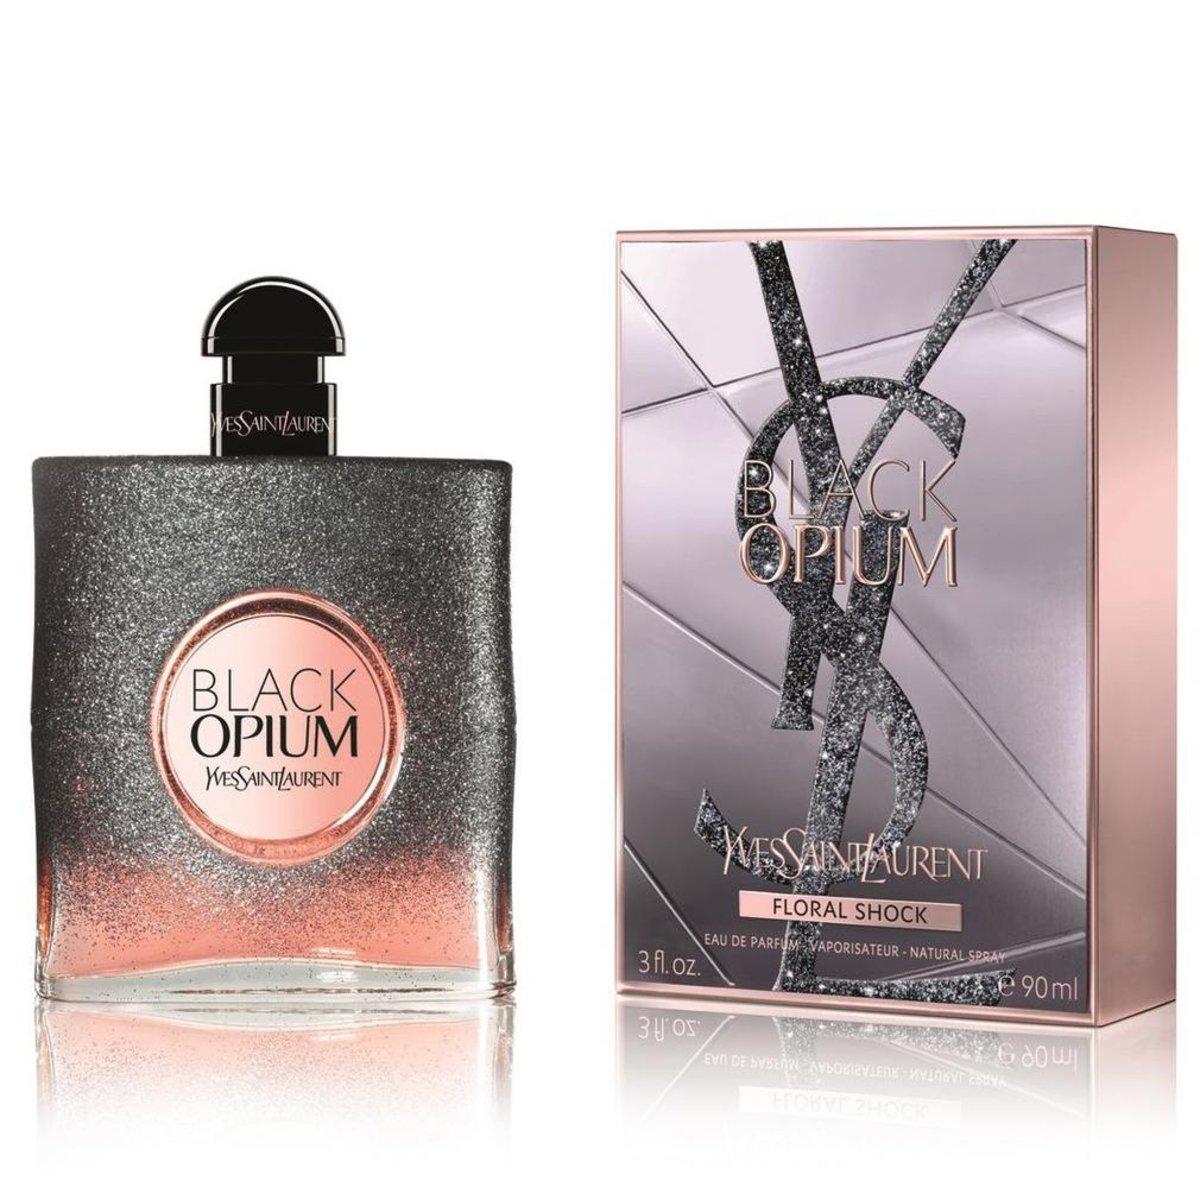 Black Opium Floral Shock EDP 90ml - [Parallel Import Pro | Festival Gift | Top Sale | Birthday Gift